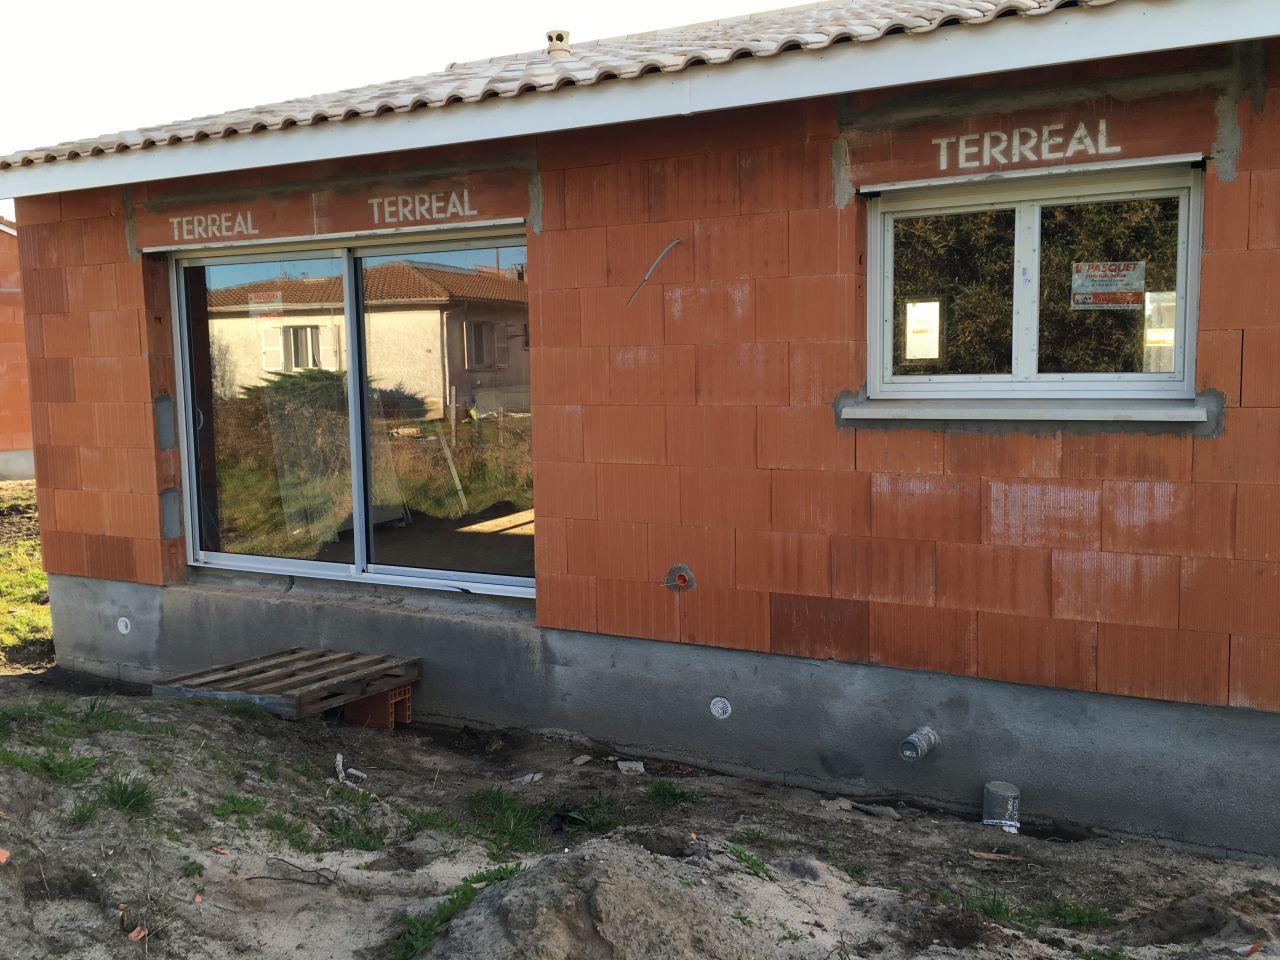 Construire sa maison hors d eau hors d air for Maison traditionnelle hors d eau hors d air